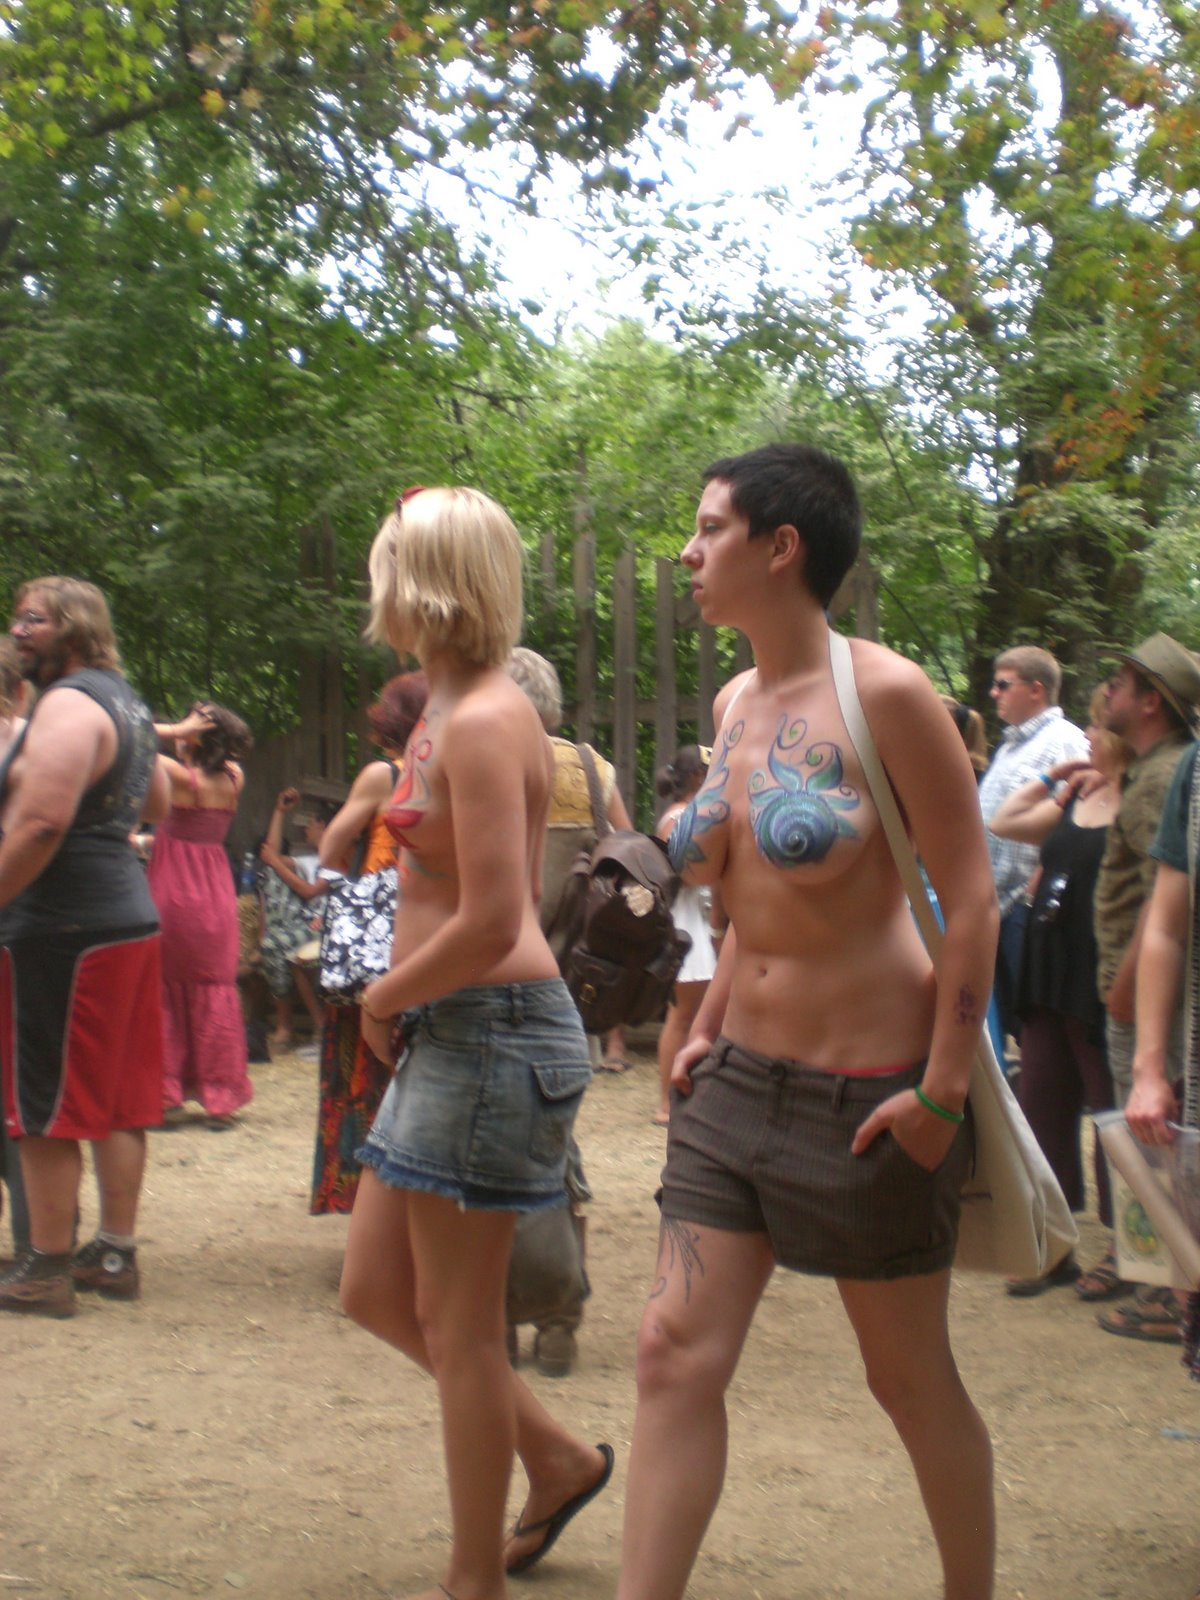 Forum naked holiday #1